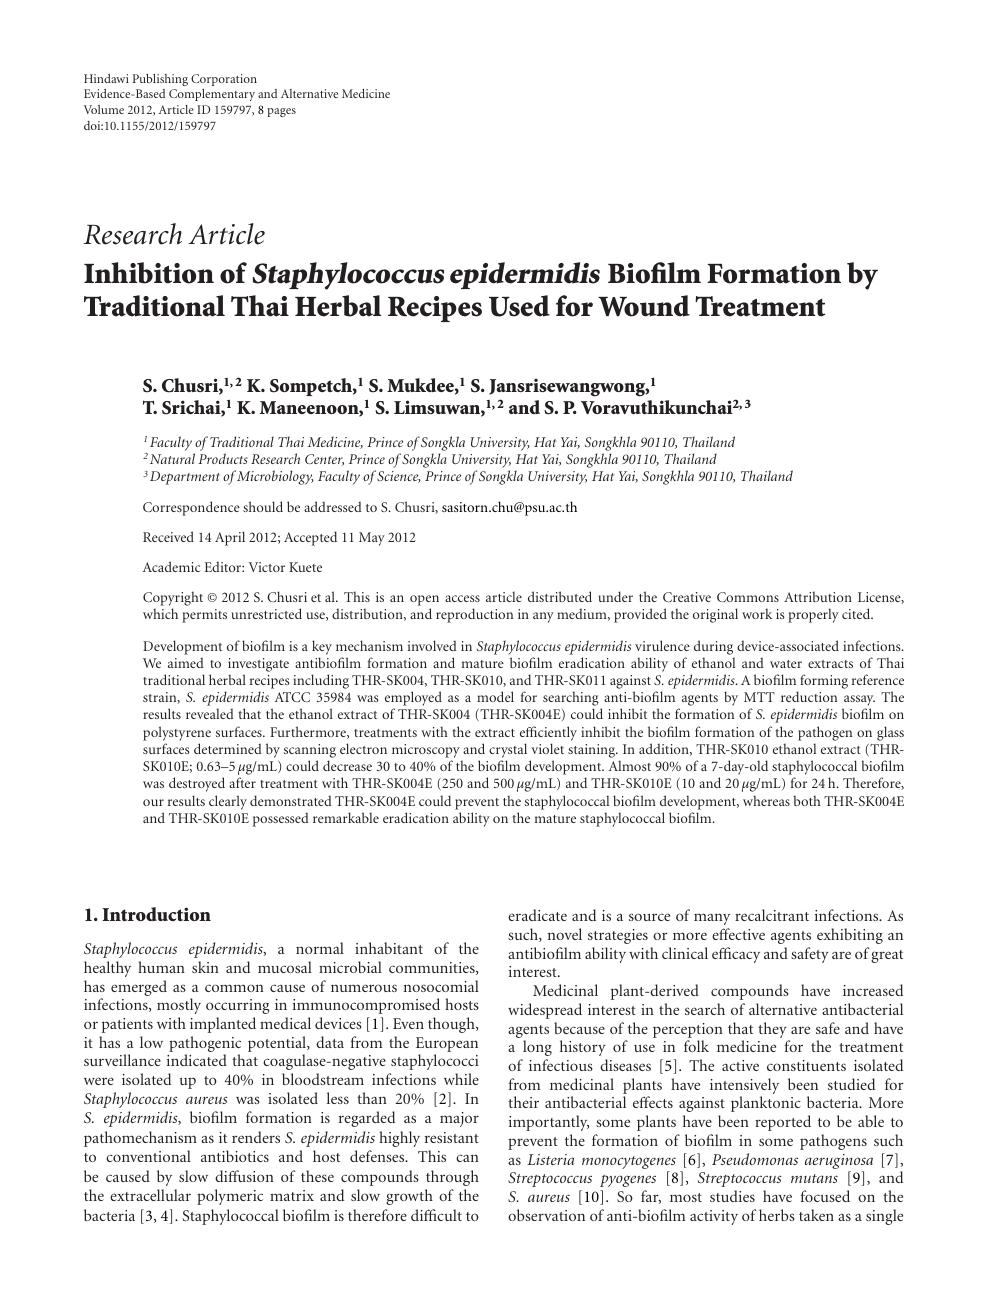 where is staphylococcus epidermidis found